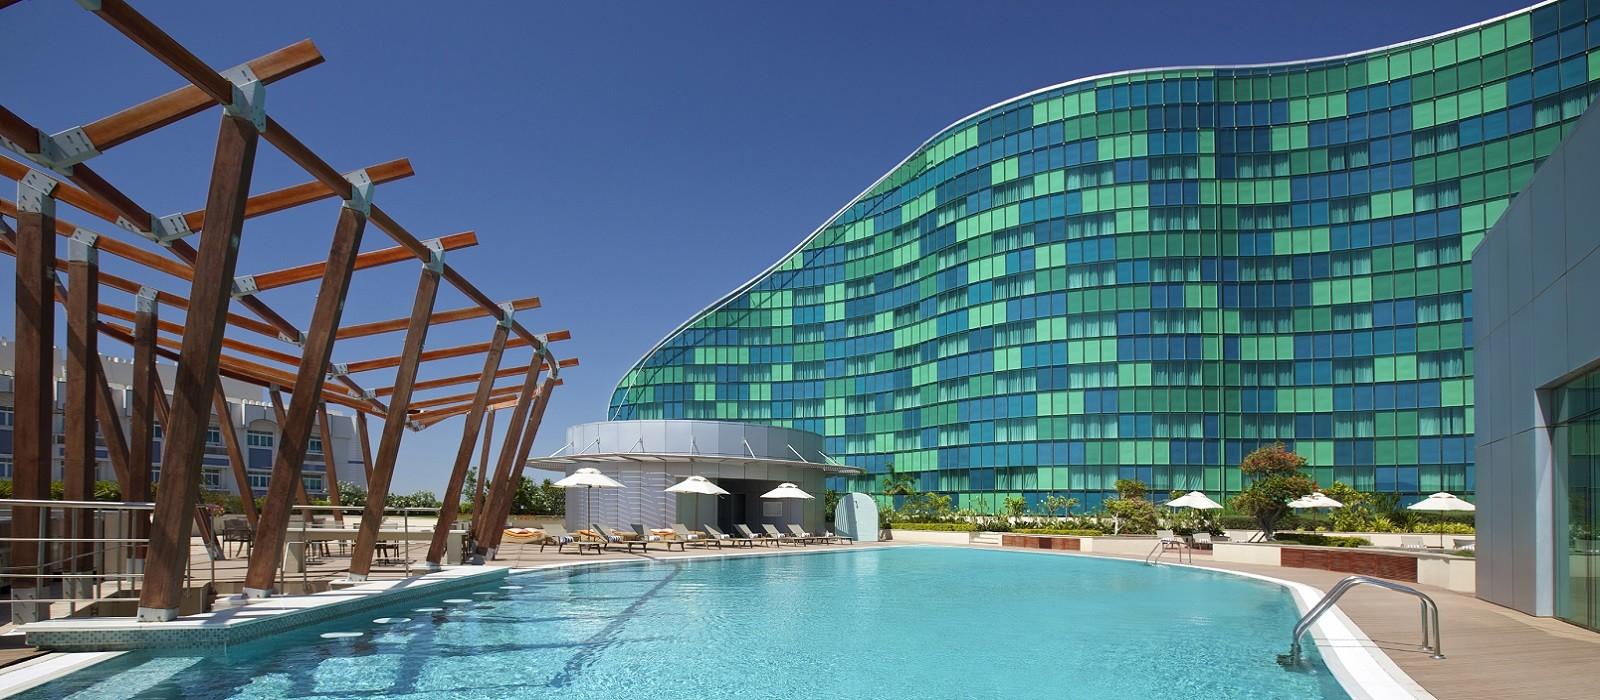 Hotel Hilton Capital Grand Abu Dhabi United Arab Emirates